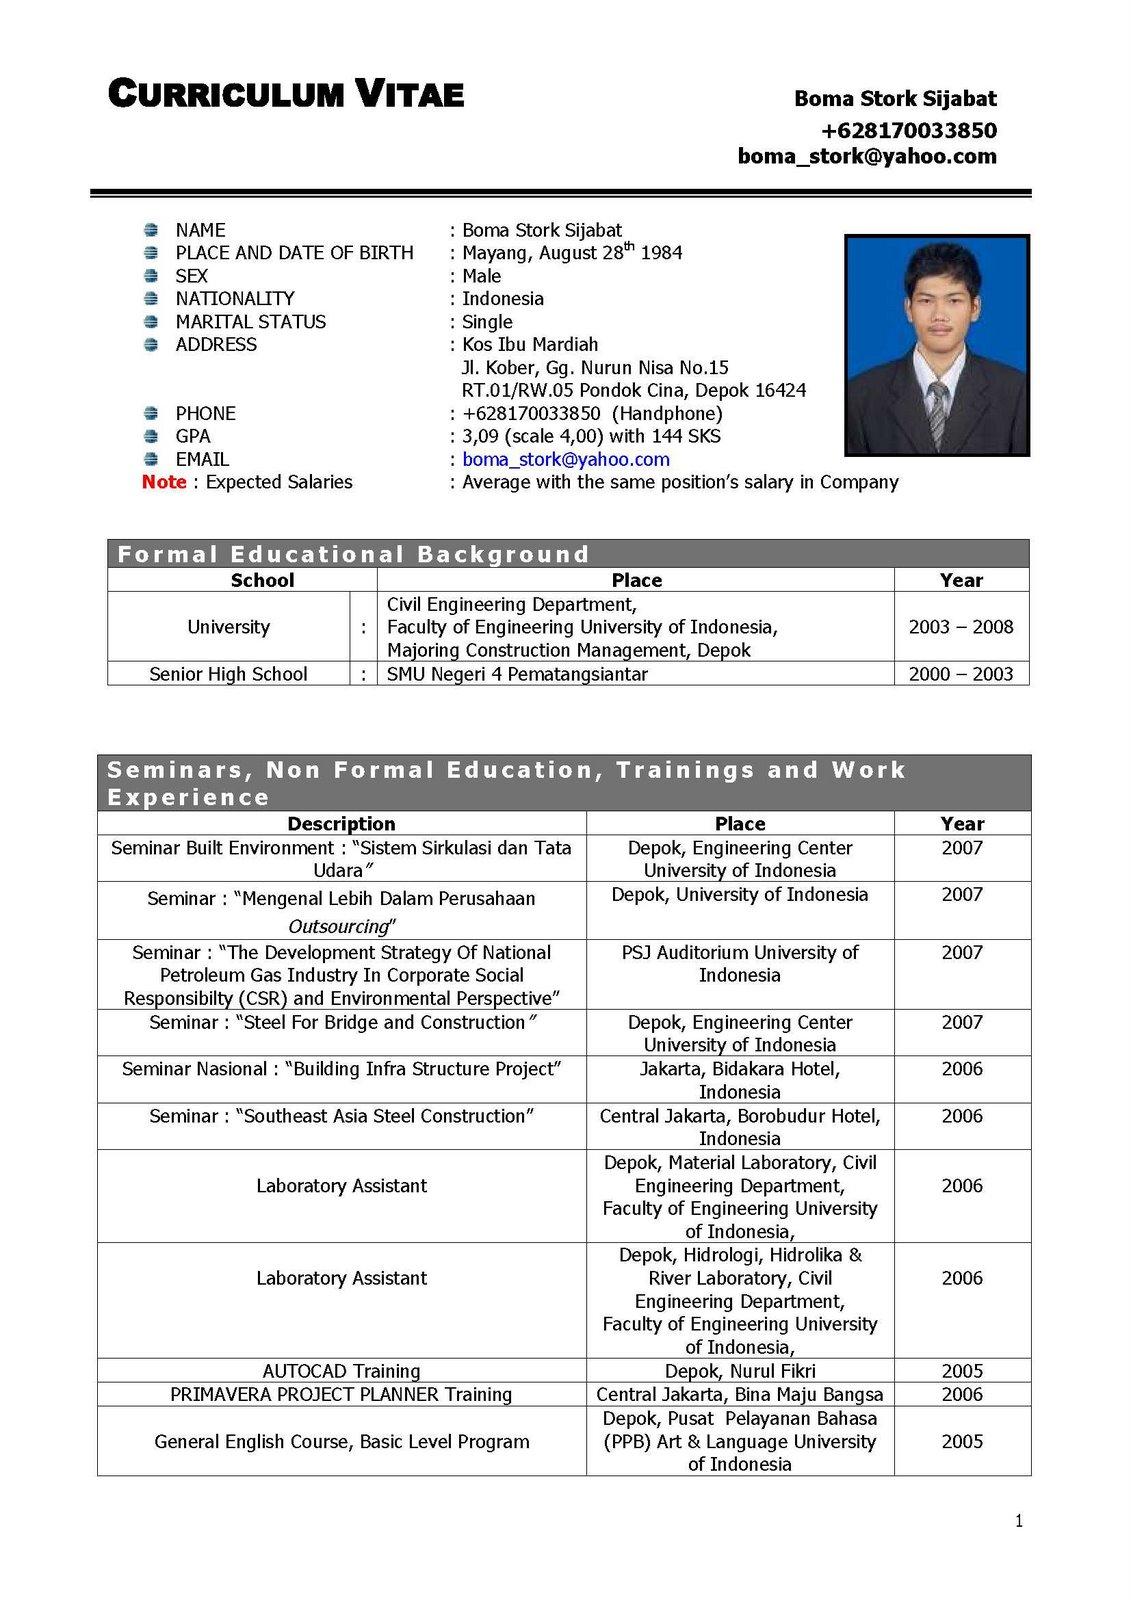 Curriculum Vitae Adalah Resume Dev5 Explorelogics Com